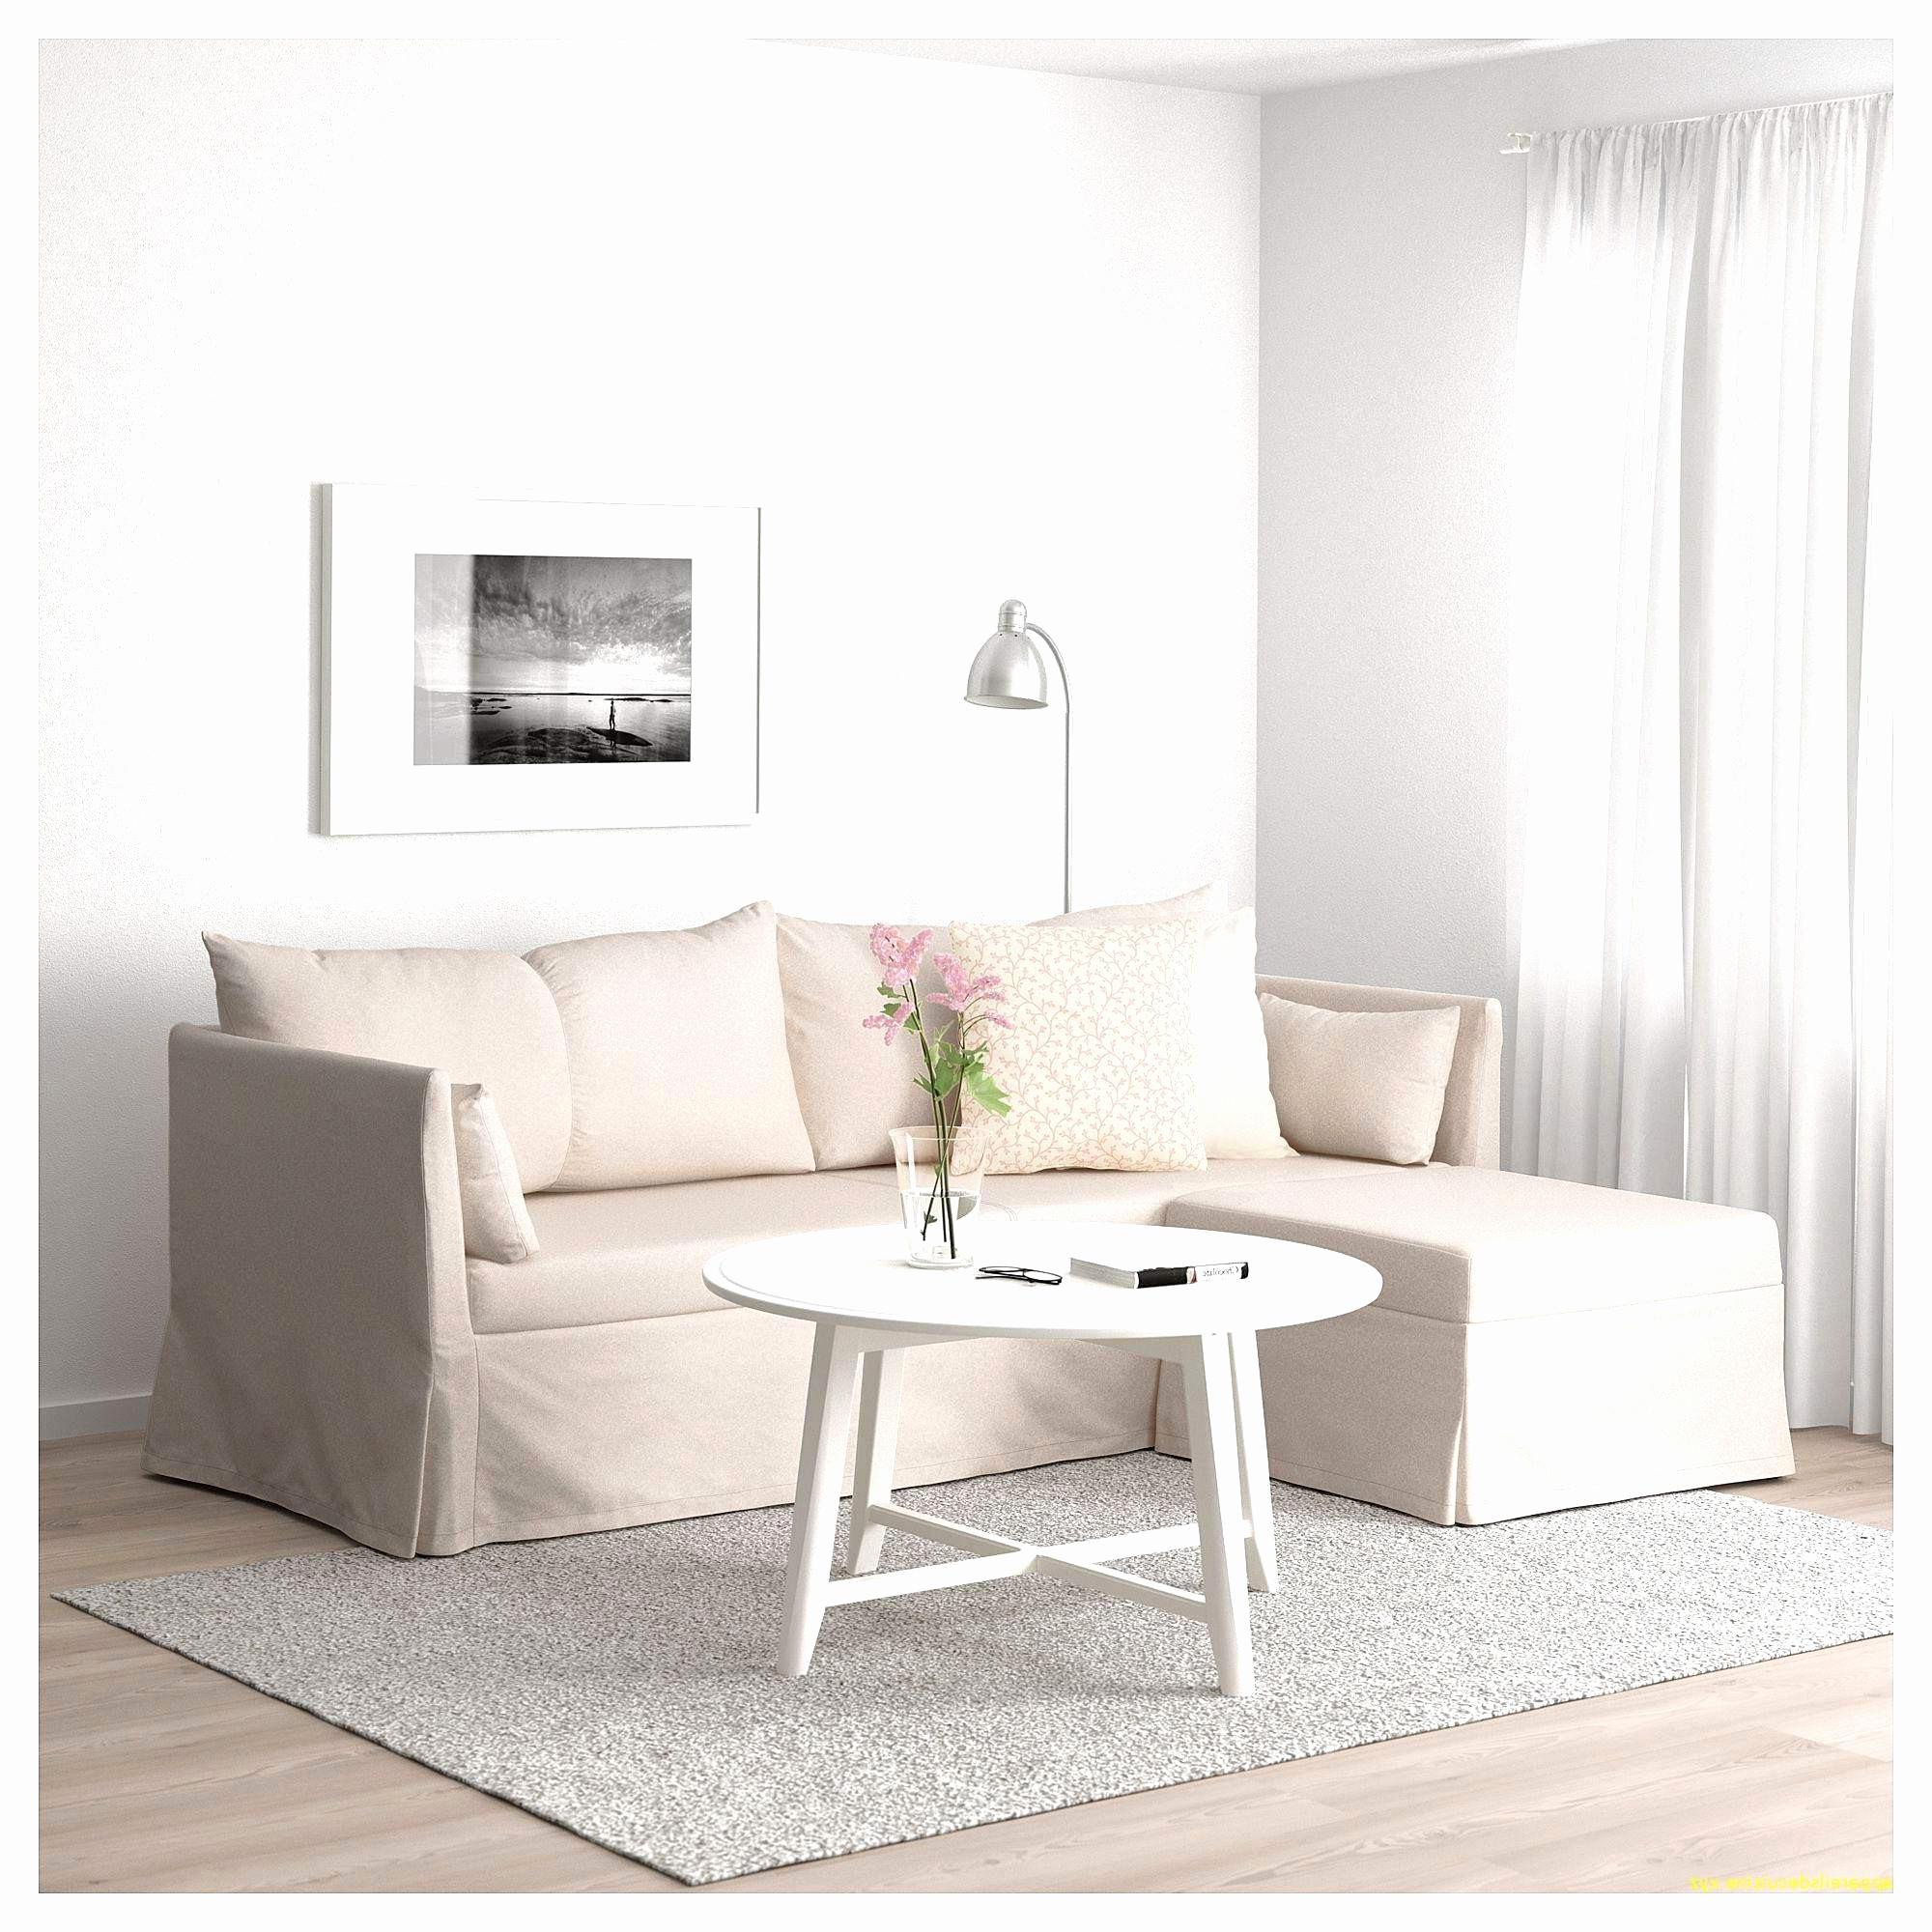 Ikea Canapé Angle Convertible Beau Photographie 23 Frais Lit Mezzanine 160×200 Ikea